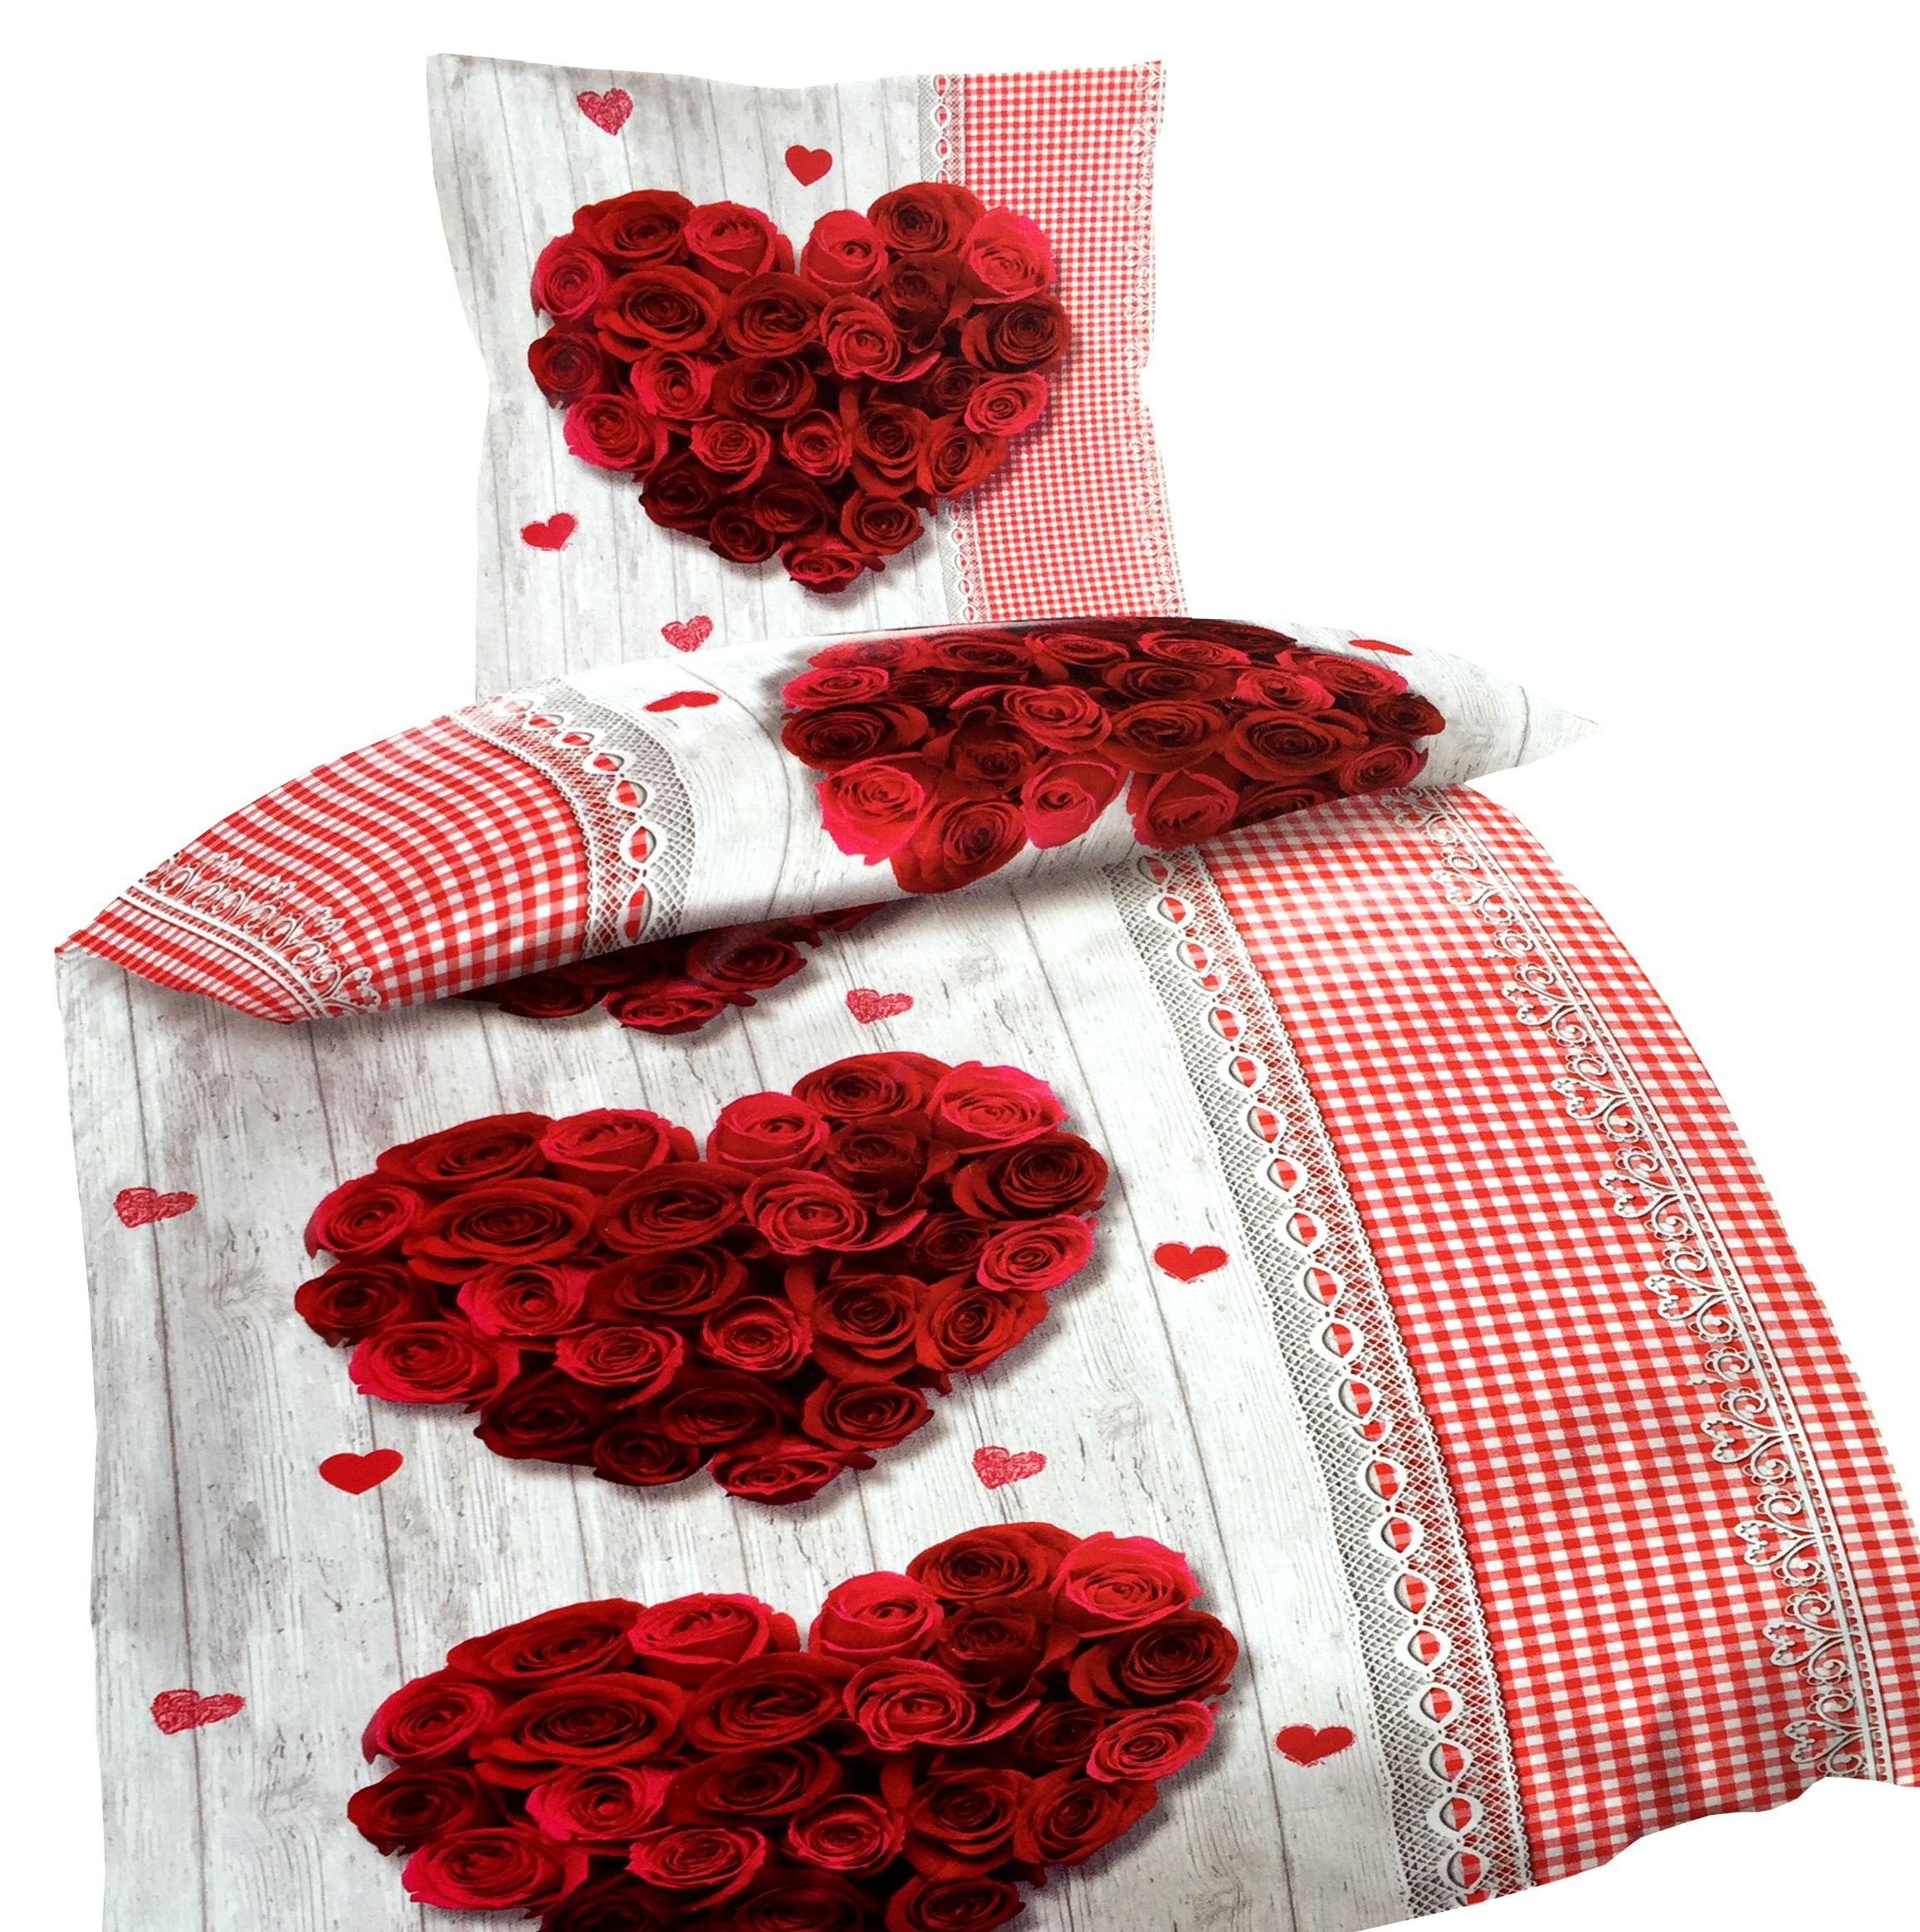 5 tlg baumwolle renforc bettw sche 135x200 cm herzen holzoptik rosen rot laken ebay. Black Bedroom Furniture Sets. Home Design Ideas